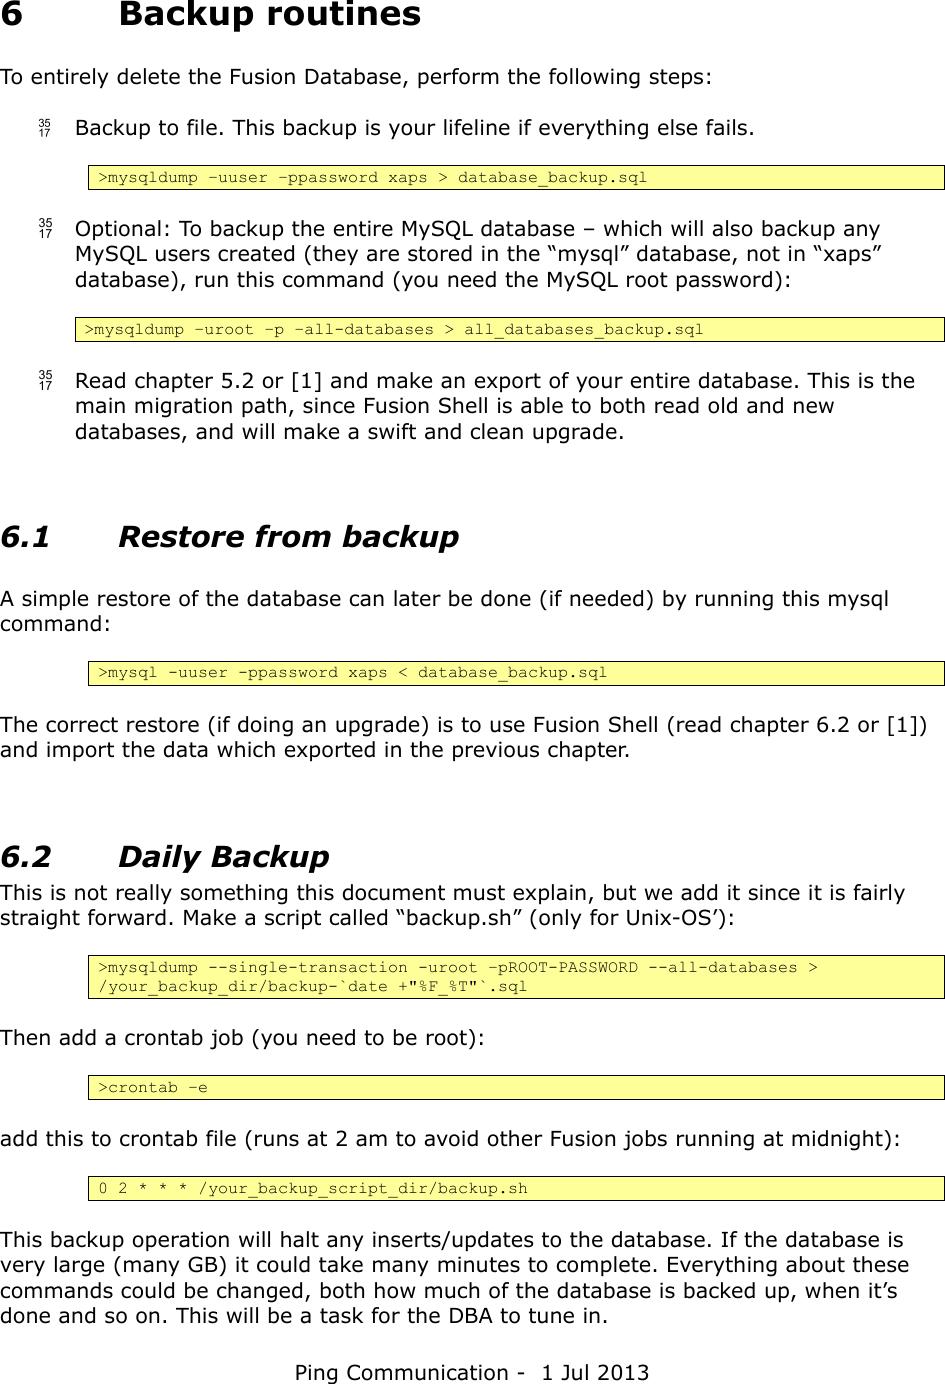 Owera Fusion Database User Manual